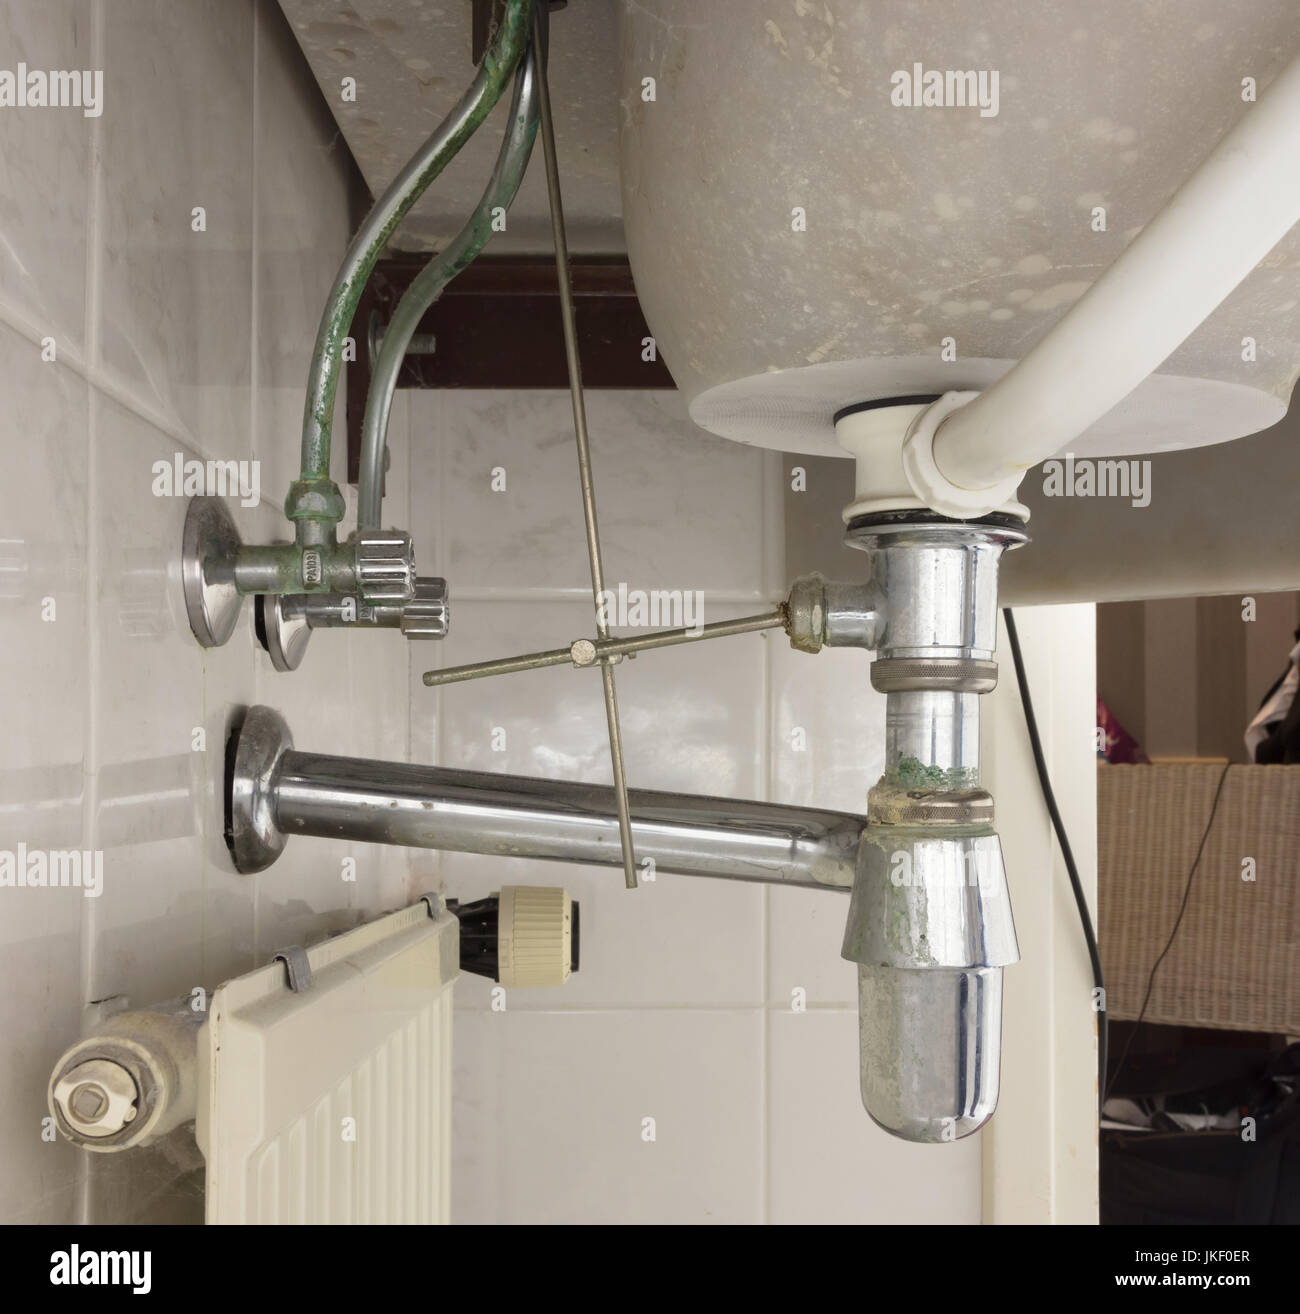 Becken Siphon Oder Waschbecken Abfluss Im Badezimmer Schmutzig